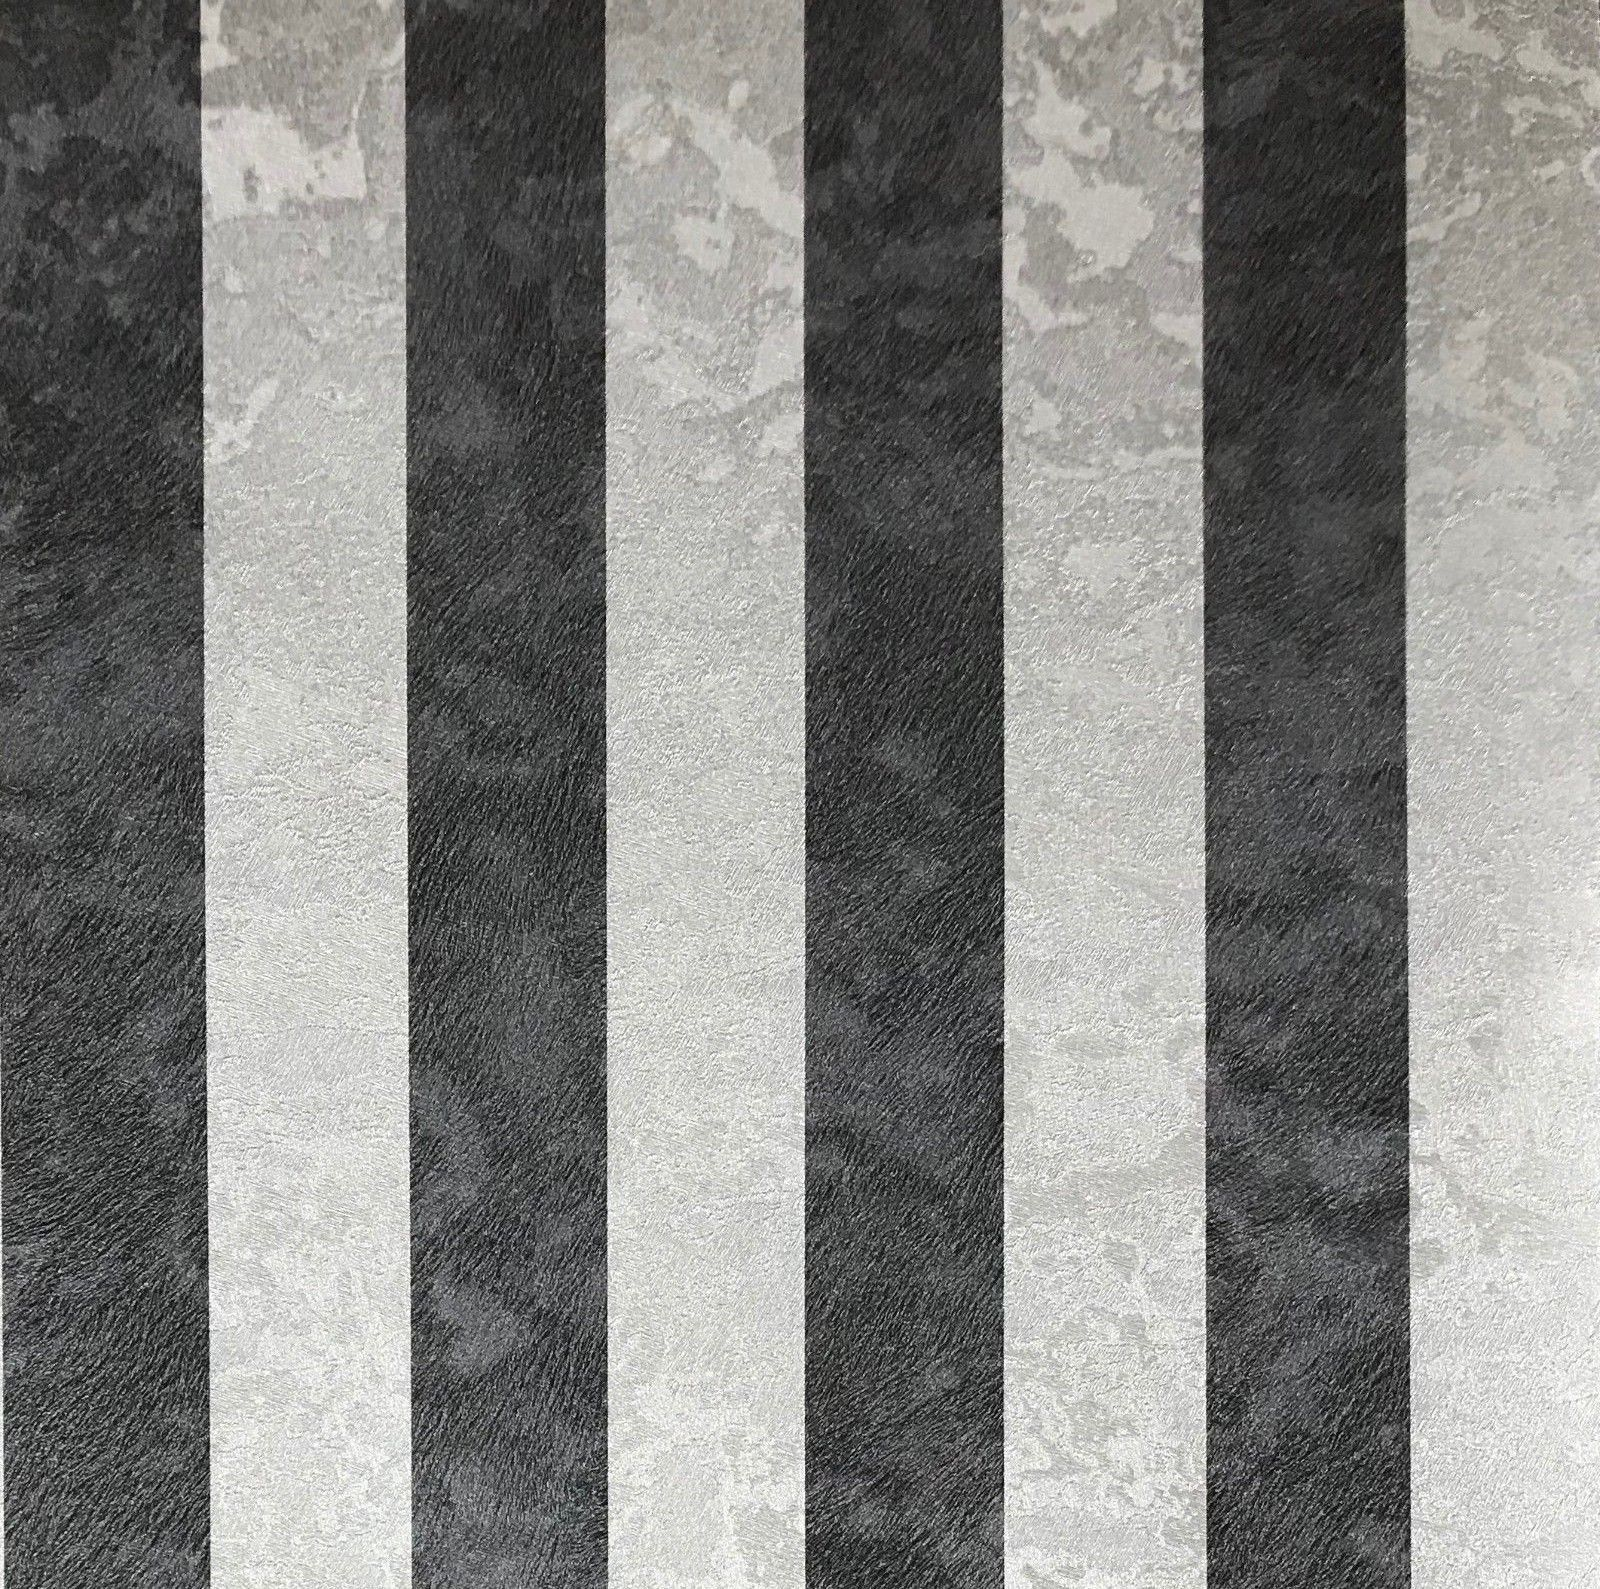 300061 Wallpaper Silver Black Metallic Textured Striped